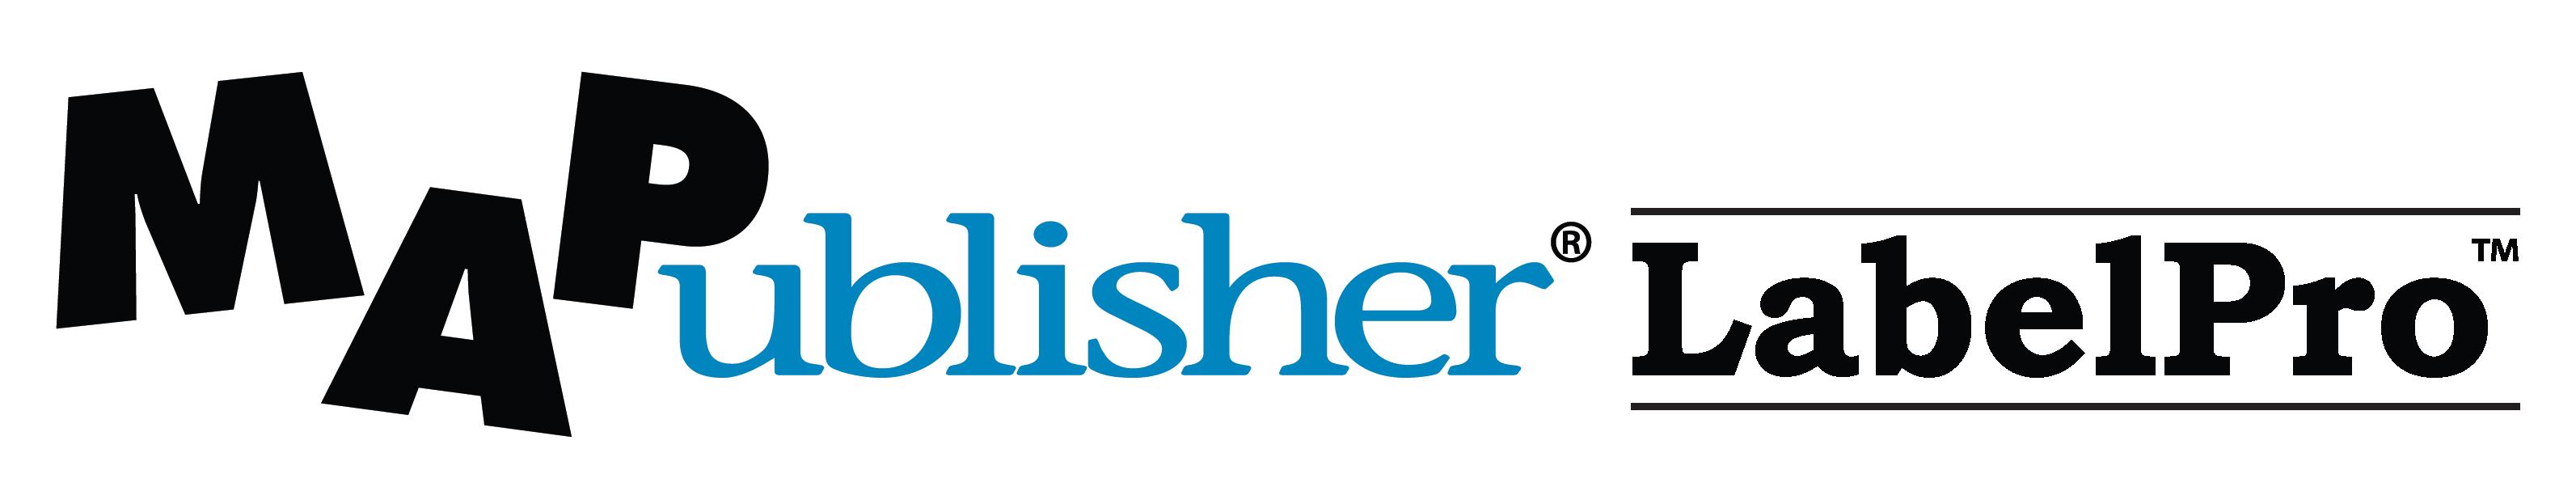 LabelPro logo